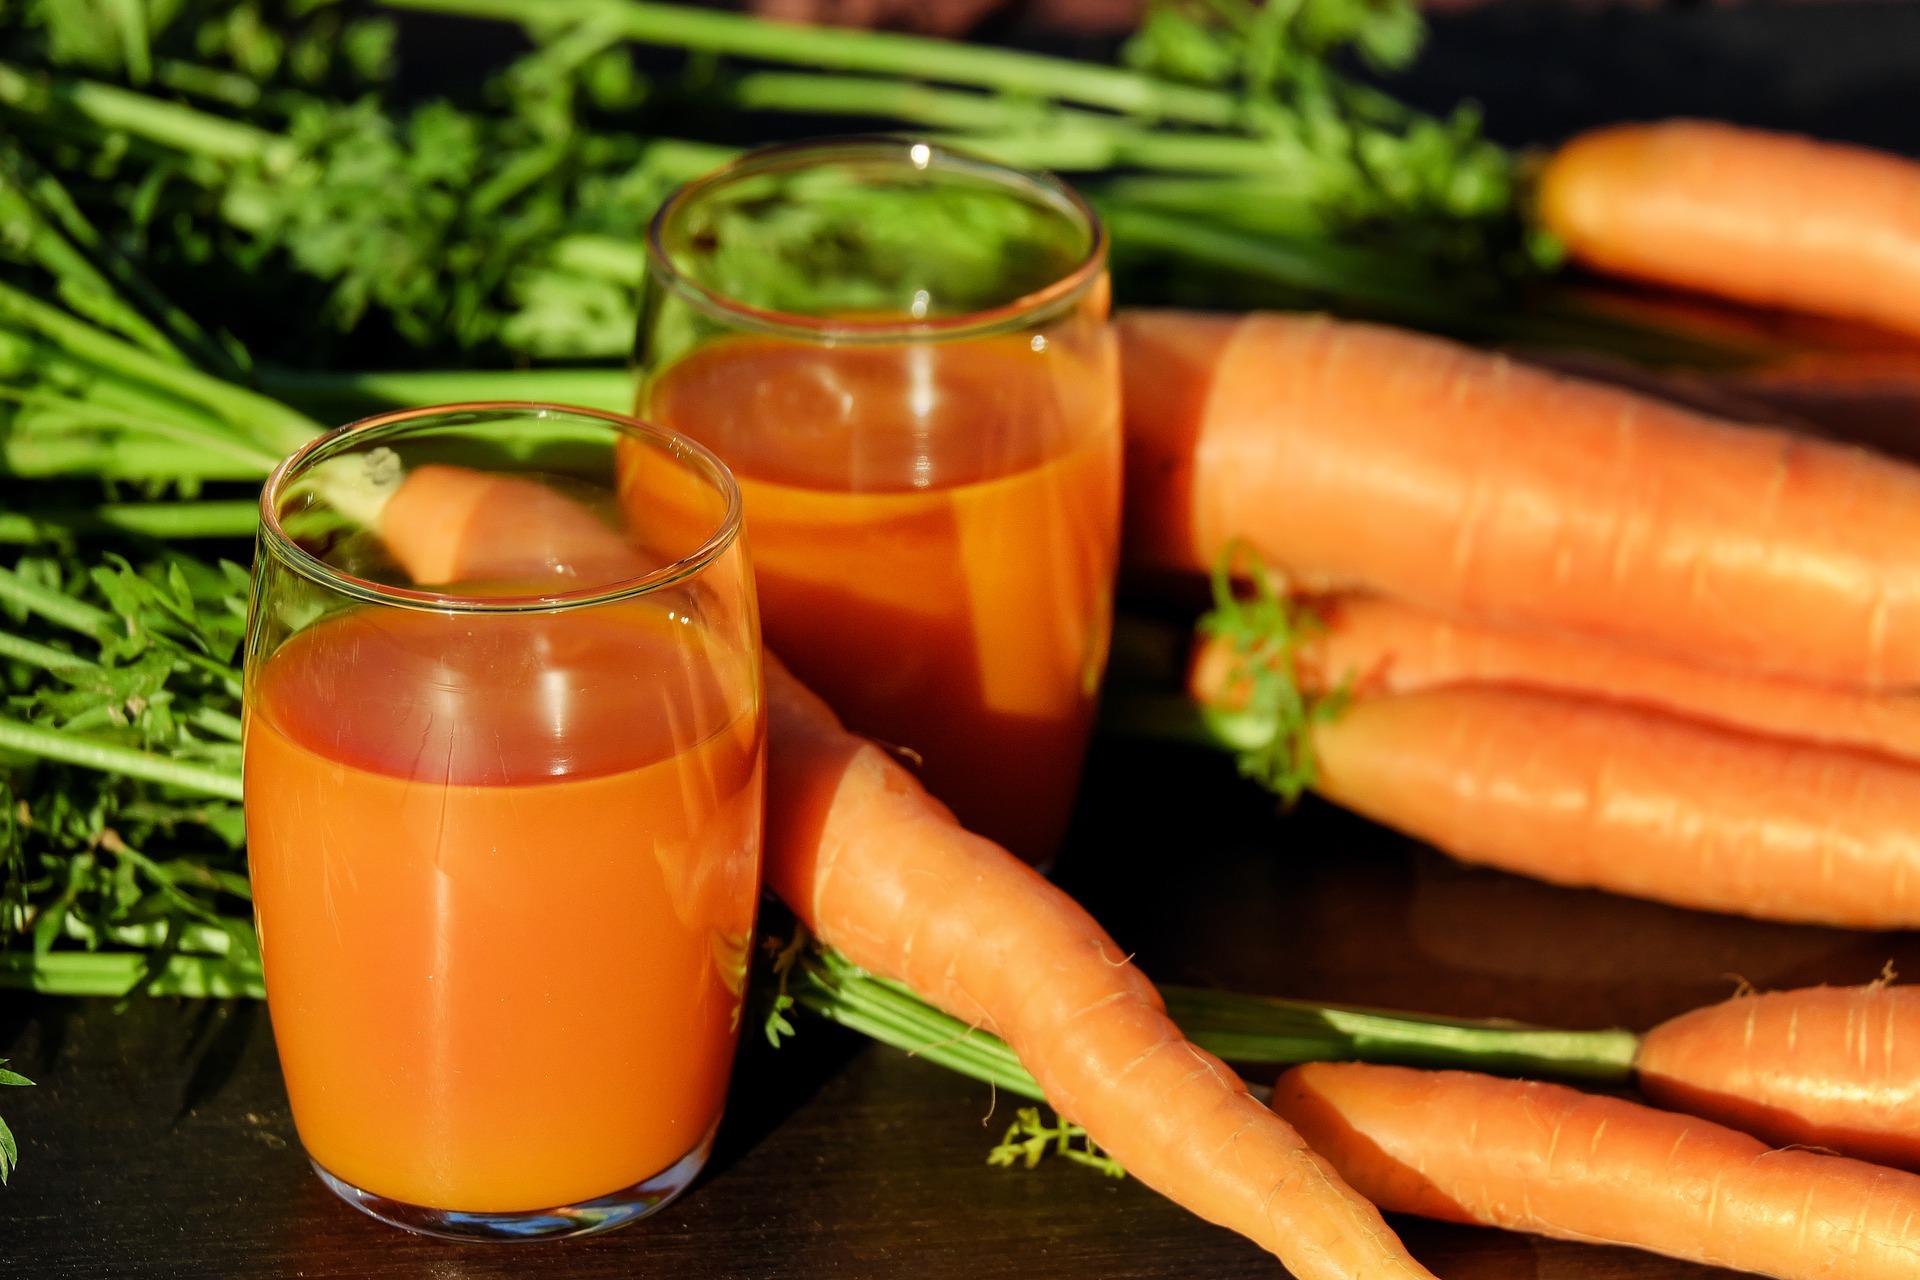 Le béta carotène est un précurseur de la vitamine A.